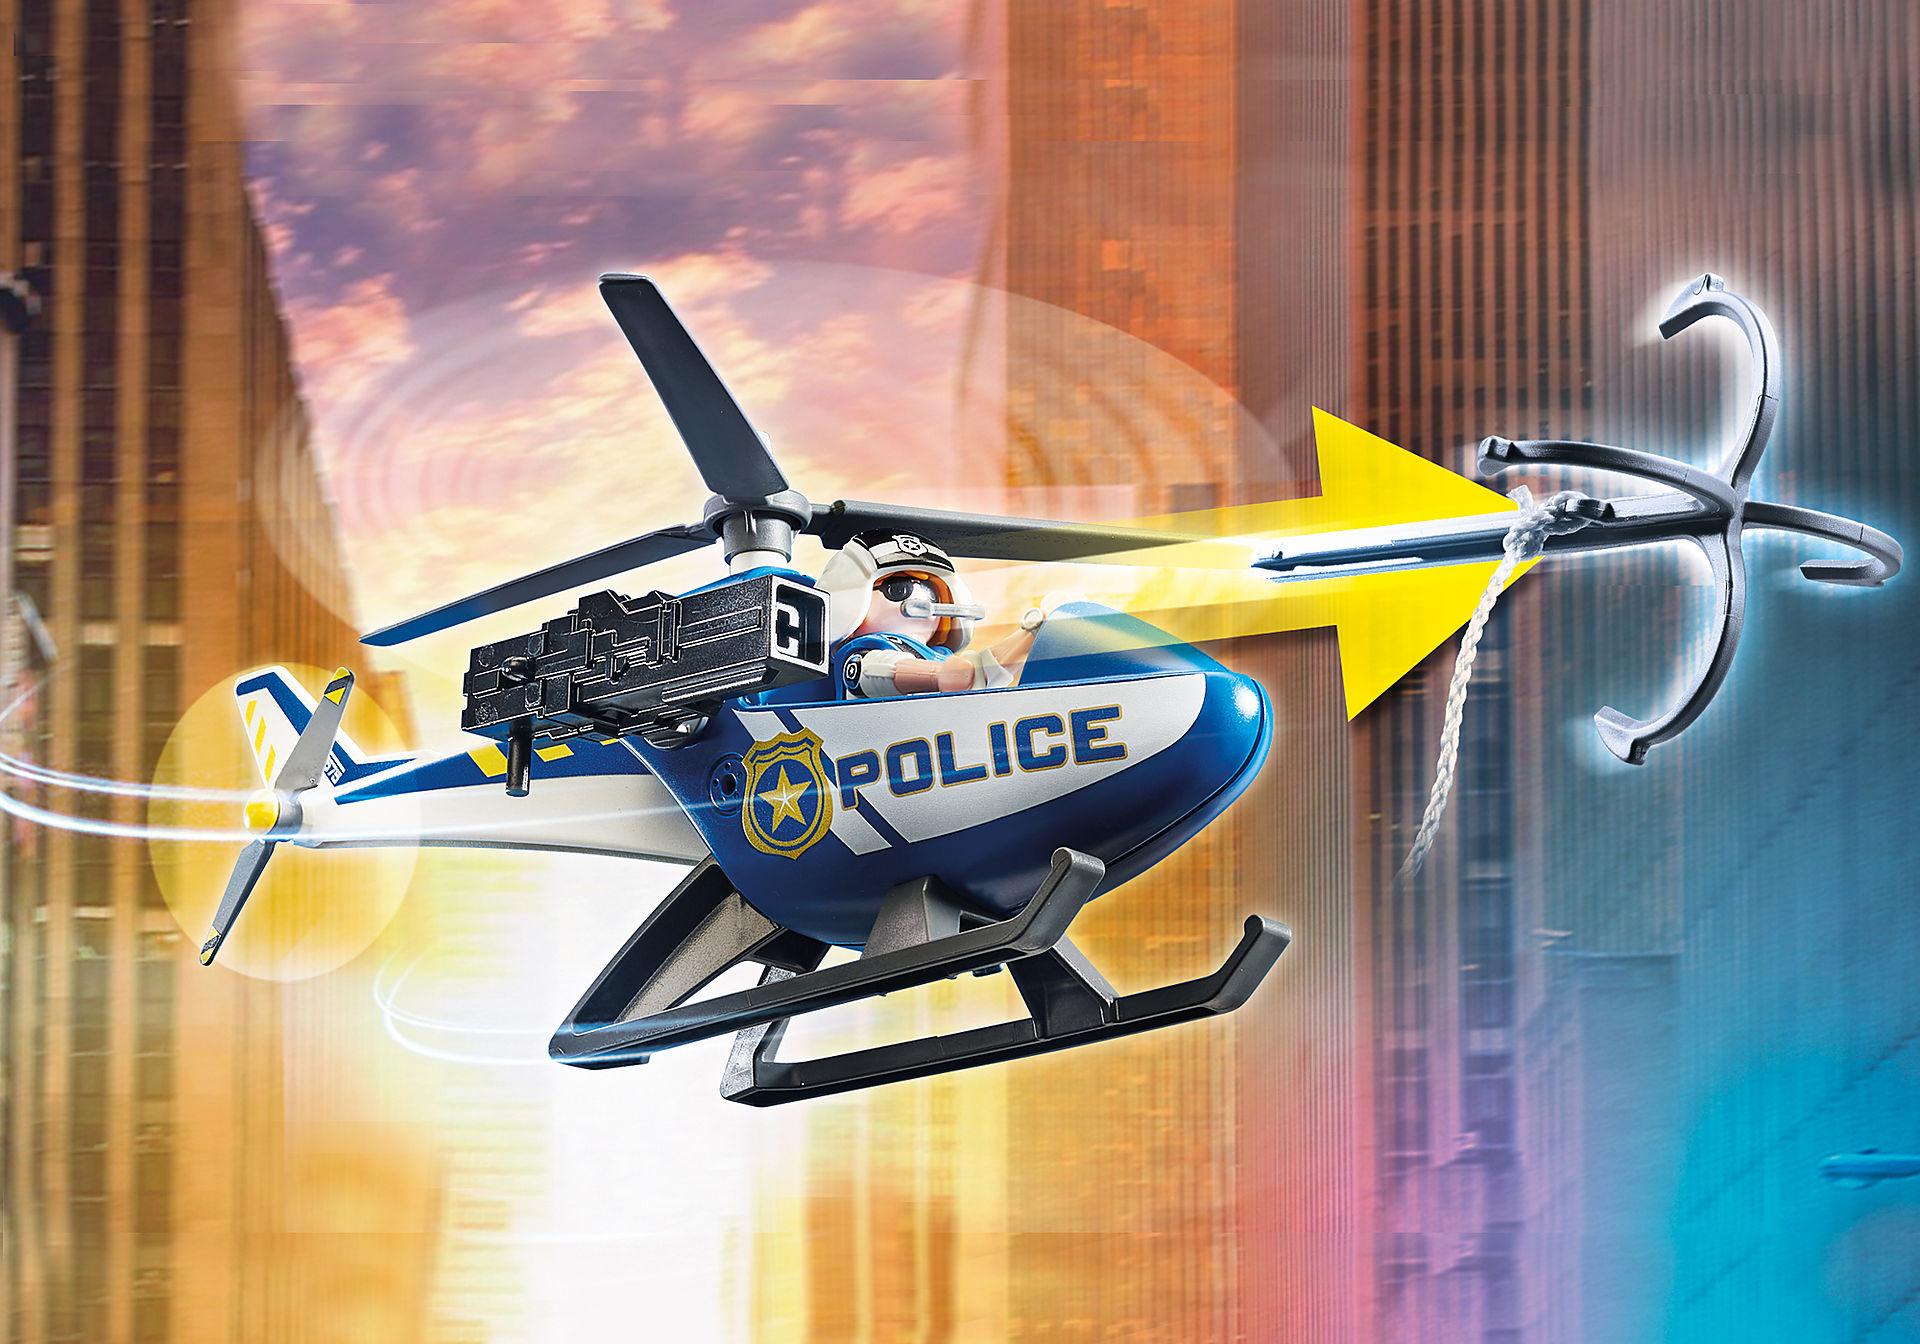 70575 Polizei-Helikopter: Verfolgung des Fluchtfahrzeugs zoom image7